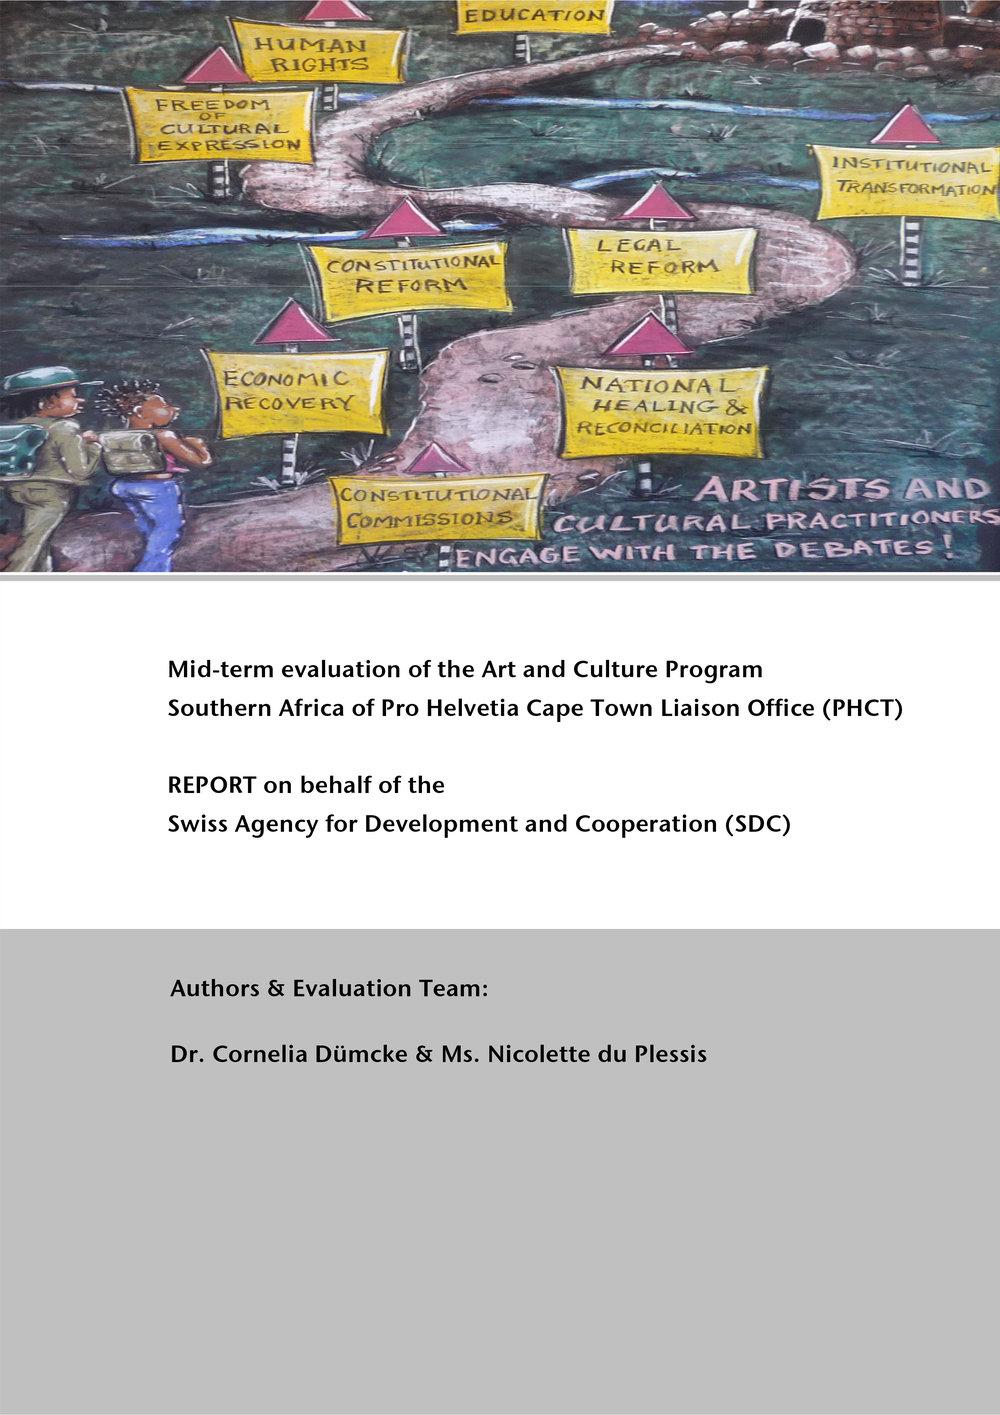 Final Report_Dumcke_du Ples sis_ACPSA 7 October 2009-1.jpg